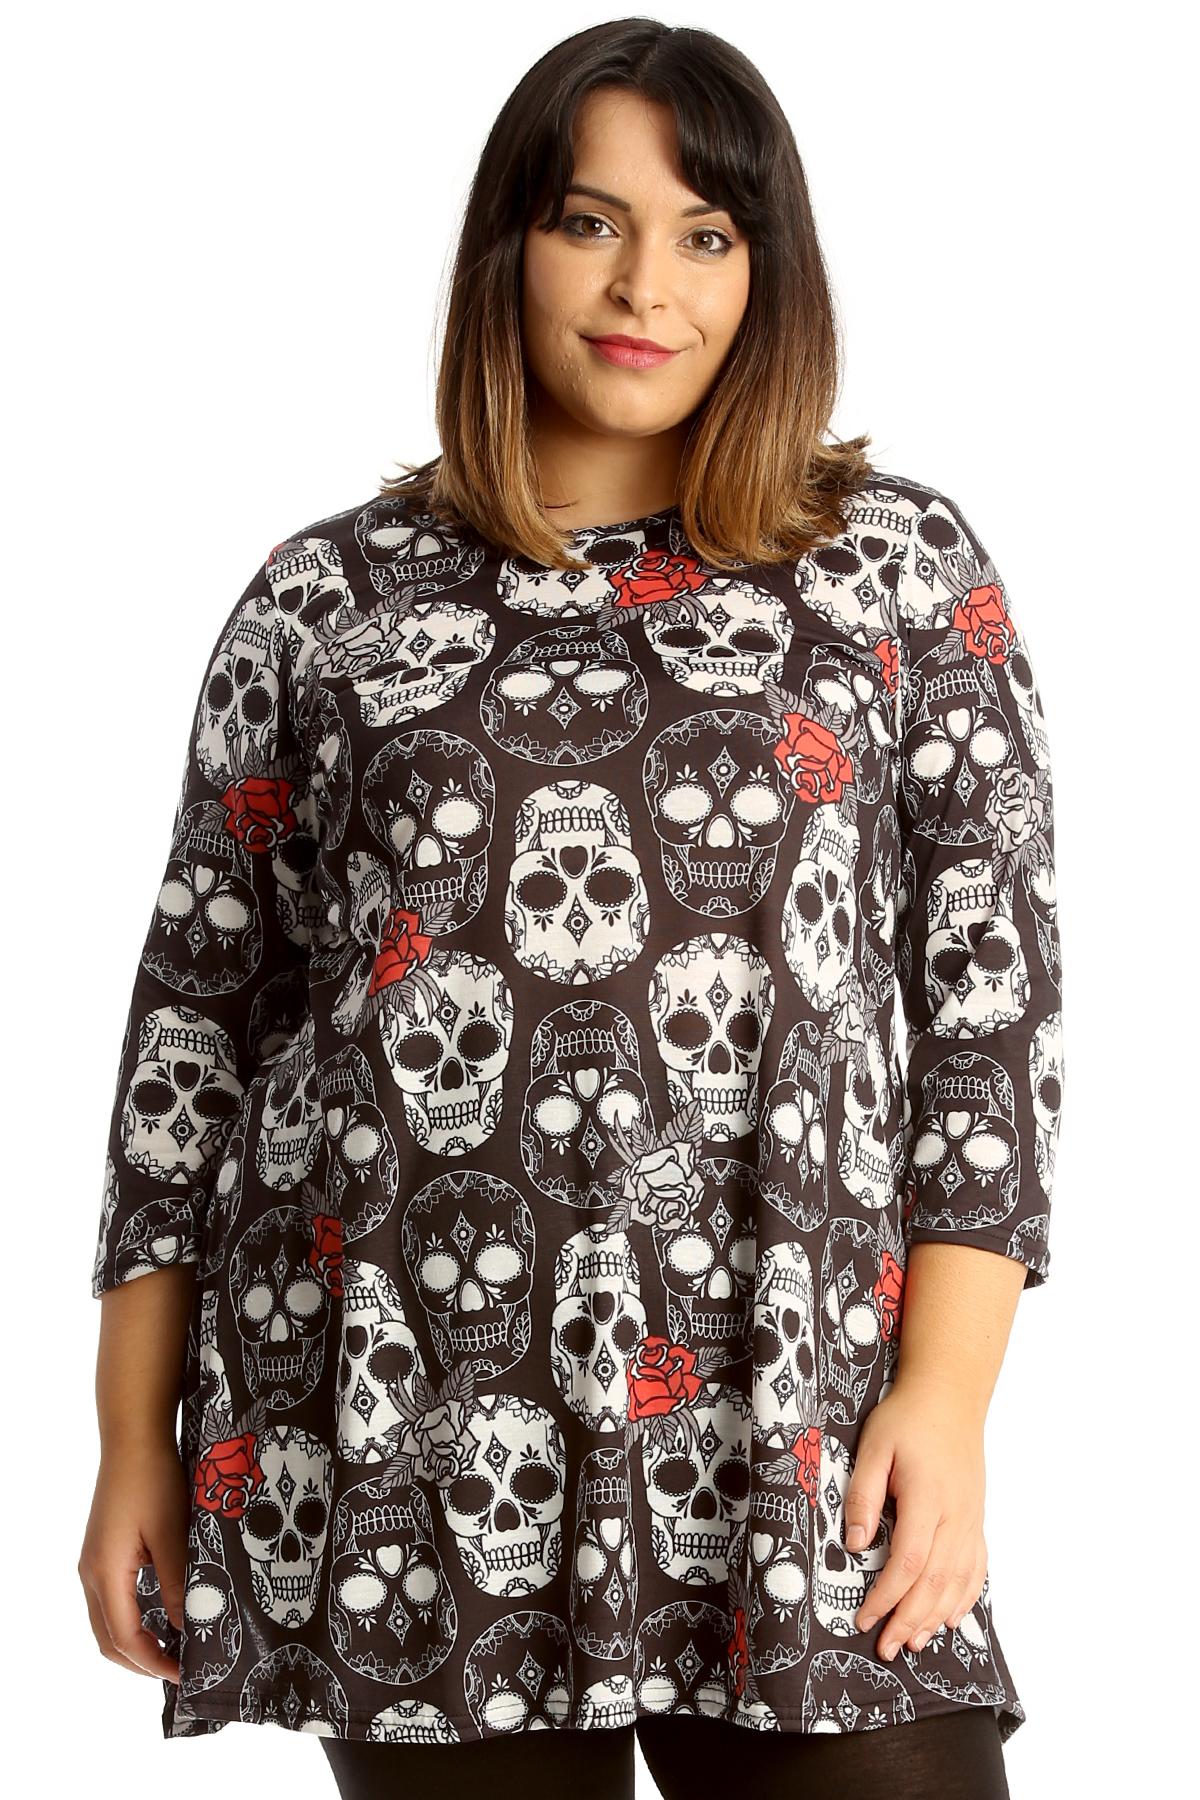 New Womens Plus Size Swing Top Ladies Skull /& Roses Print Skater Tunic Halloween